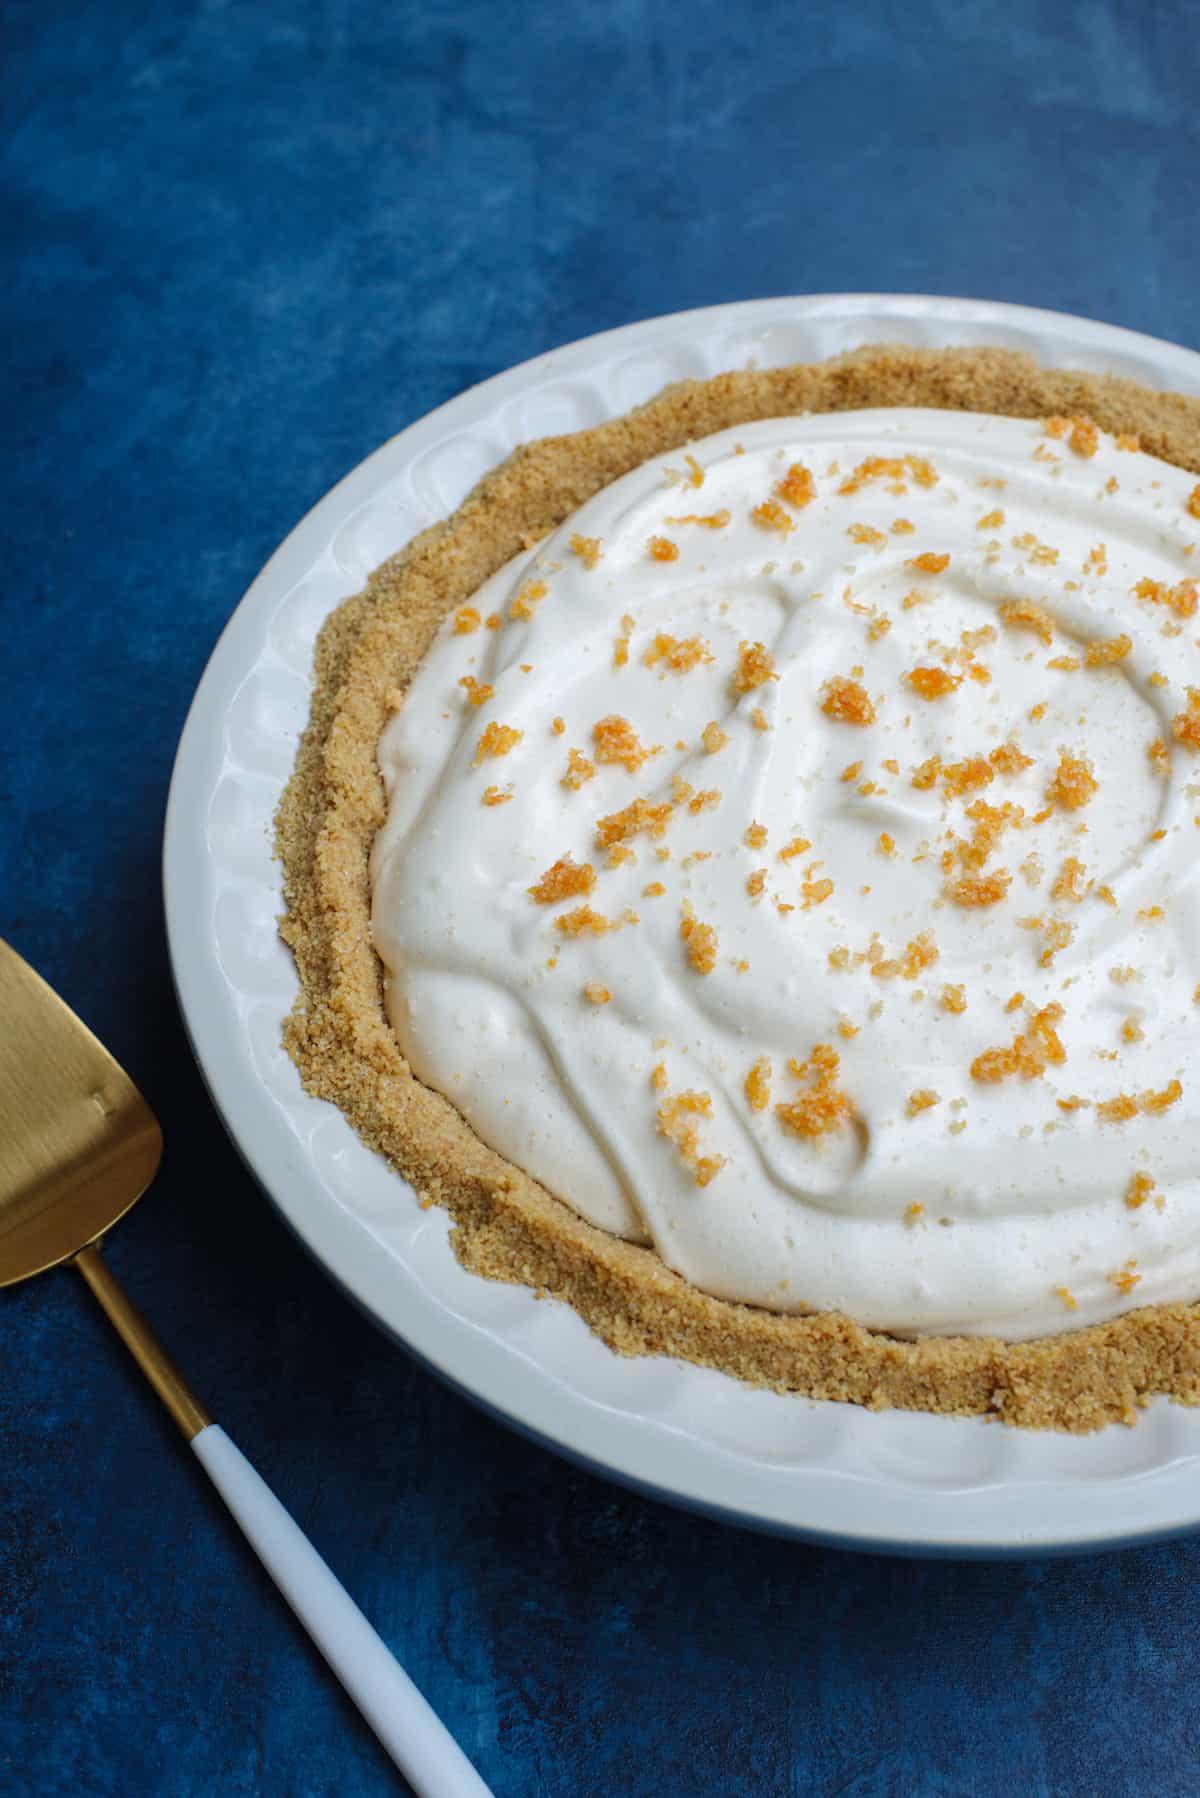 Grapefruit Chiffon Pie Recipe by Tiffani Thiessen